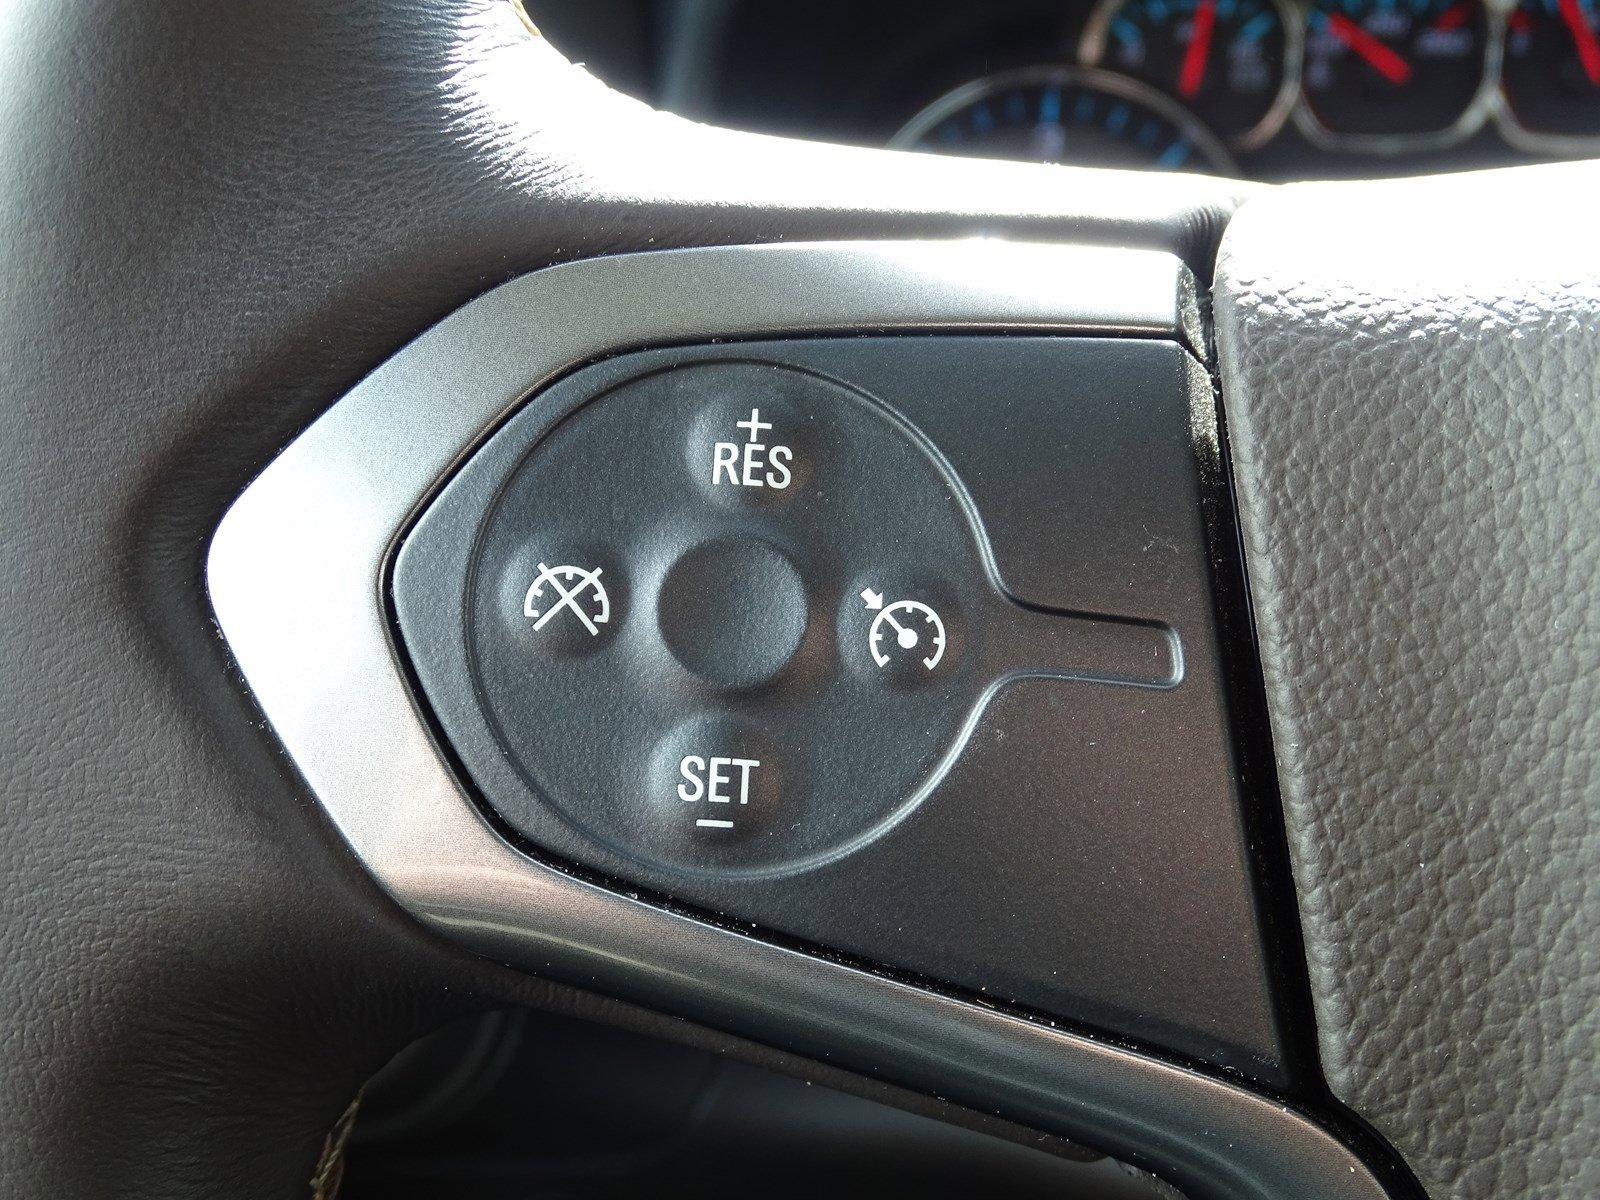 Pre-Owned 2015 Chevrolet Silverado 1500 LTZ